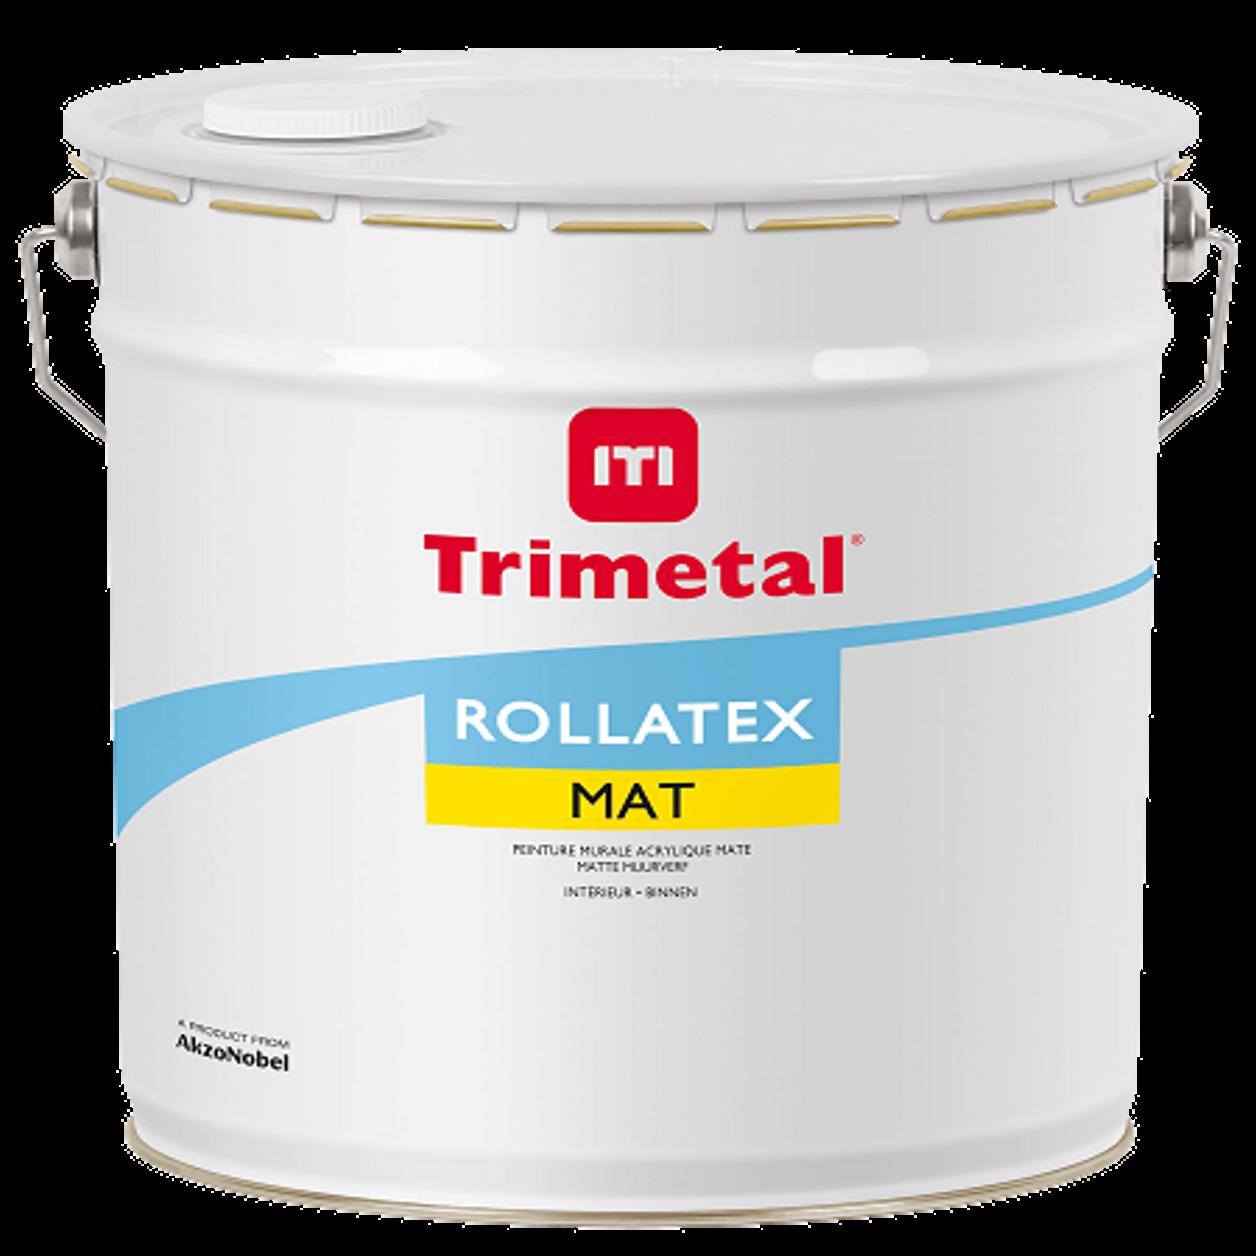 Rollatex mat trimetal - Prix peinture zolpan blanc ...